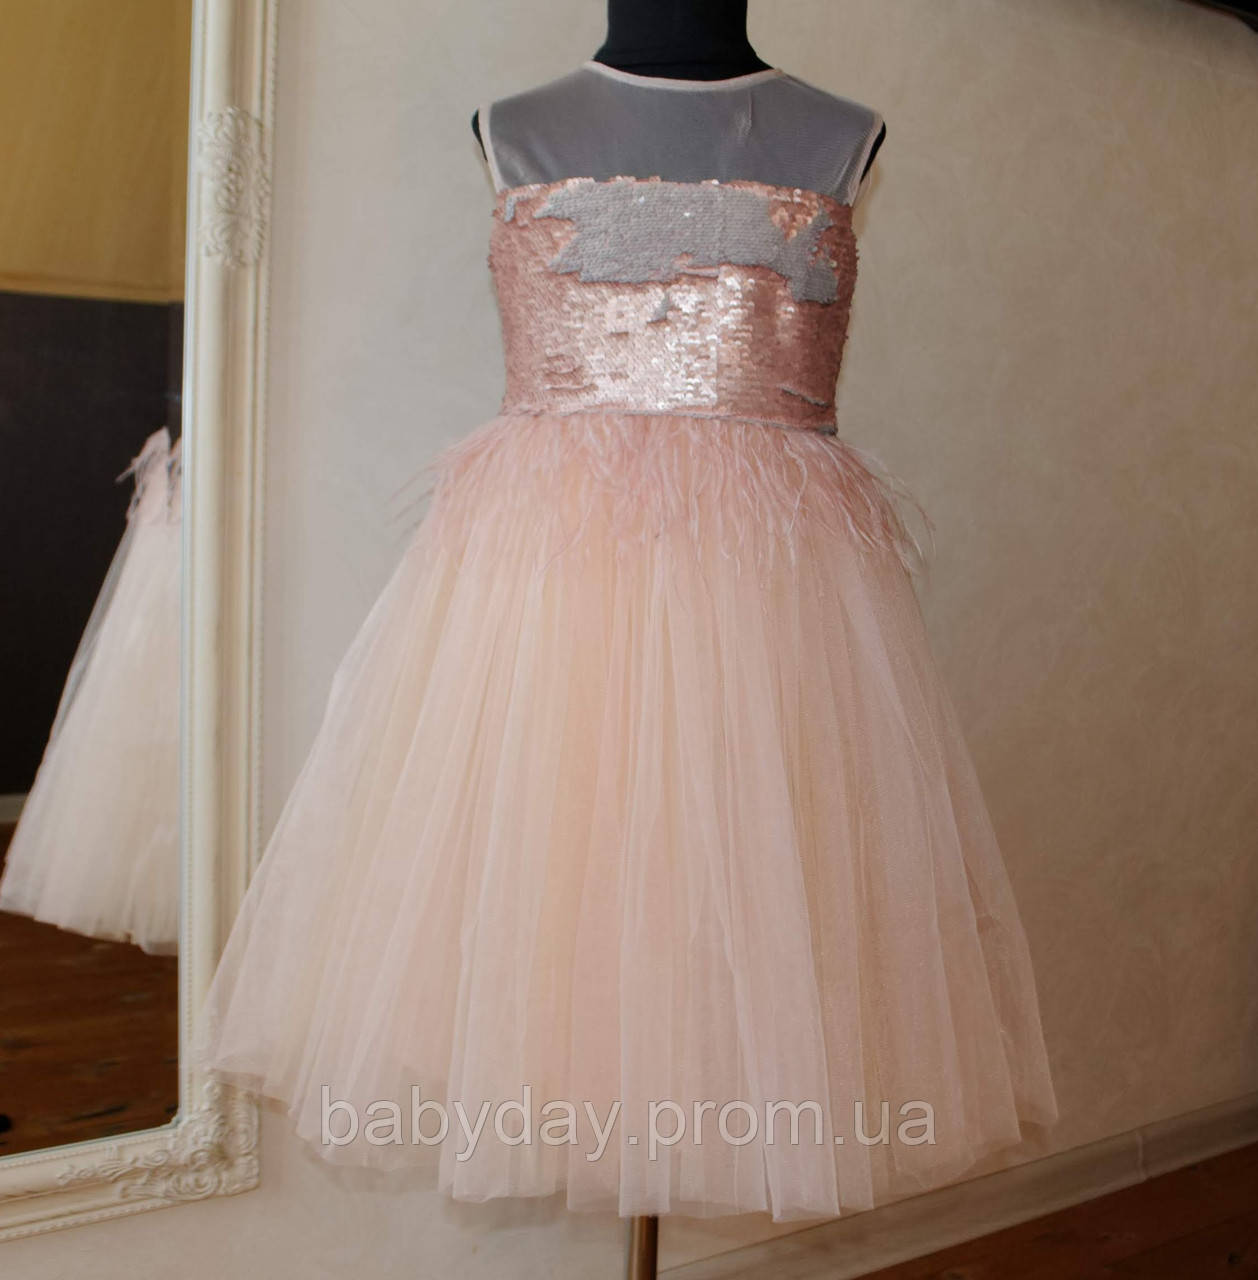 f0a83df493f Нарядное Платье Пудра с Пайетками Размеры 122